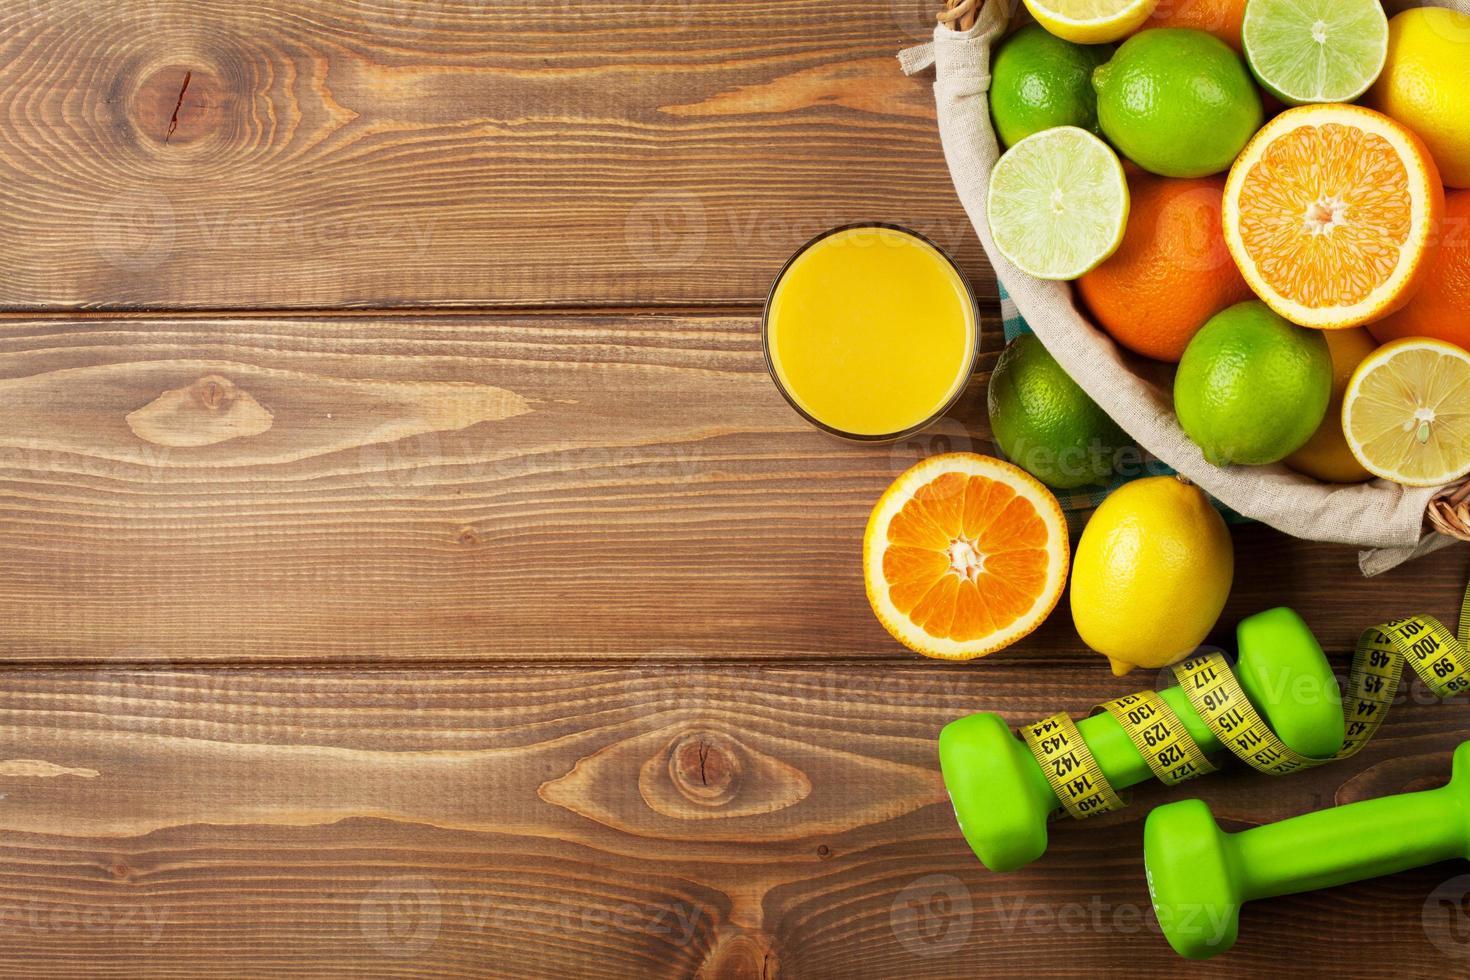 Citrus fruits in basket and dumbells. Oranges, limes and lemons photo